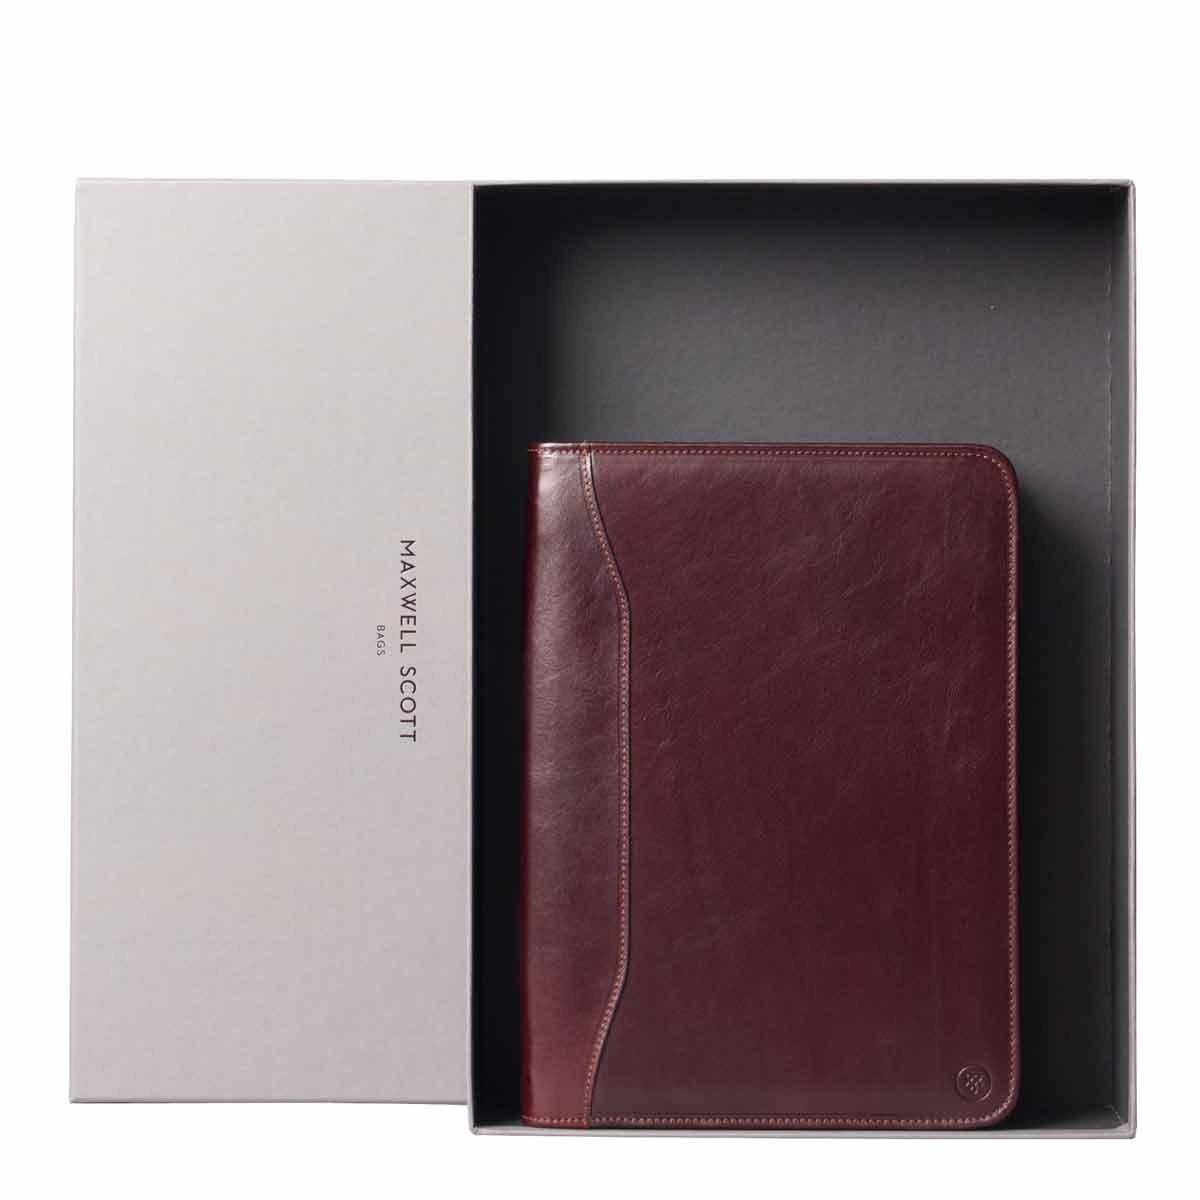 Maxwell Scott Luxury Italian Zipped Mock Croc Leather Document Folder - Black